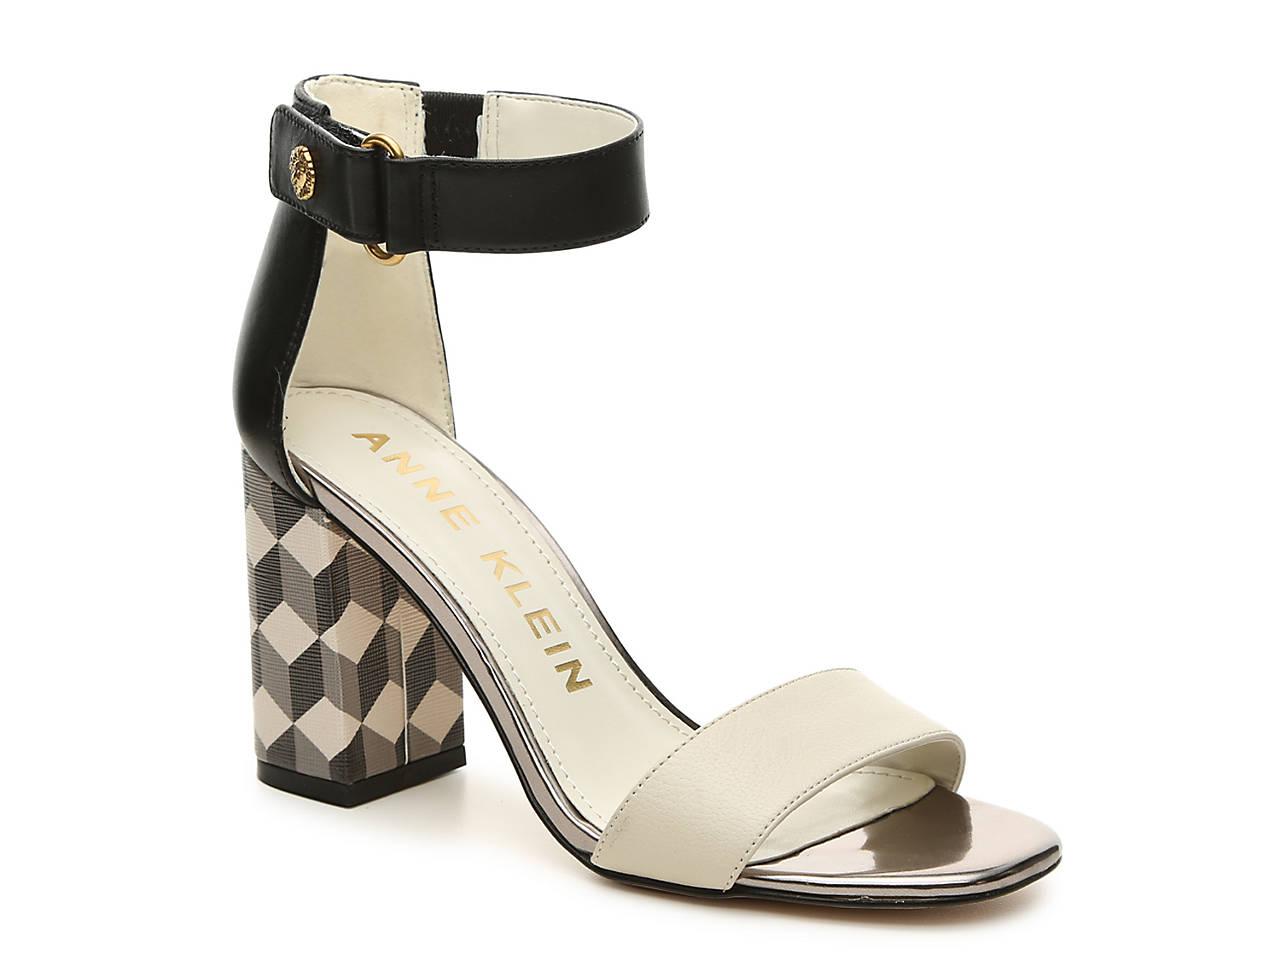 Womens sandals reddit - Anne Klein Watchme Leather Dress Sandal In Black Geometric